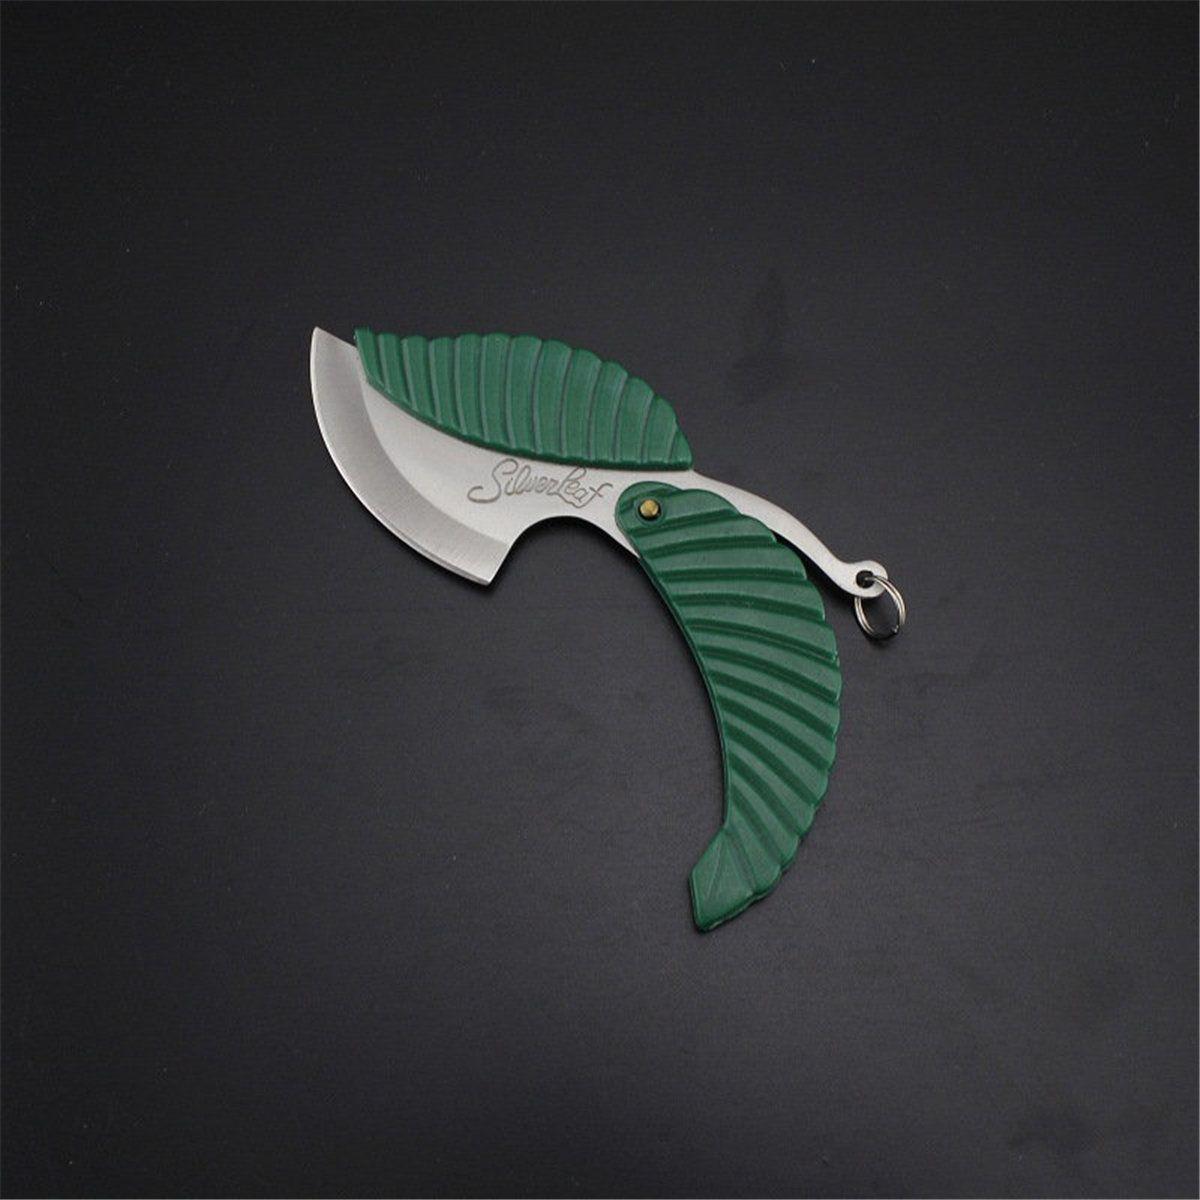 1pcs Green Mini Fold Leaf Shape Pocket Knife Folding Car-styling Keychain Outdoor Camp Knifes Camping Hiking Survival Tool